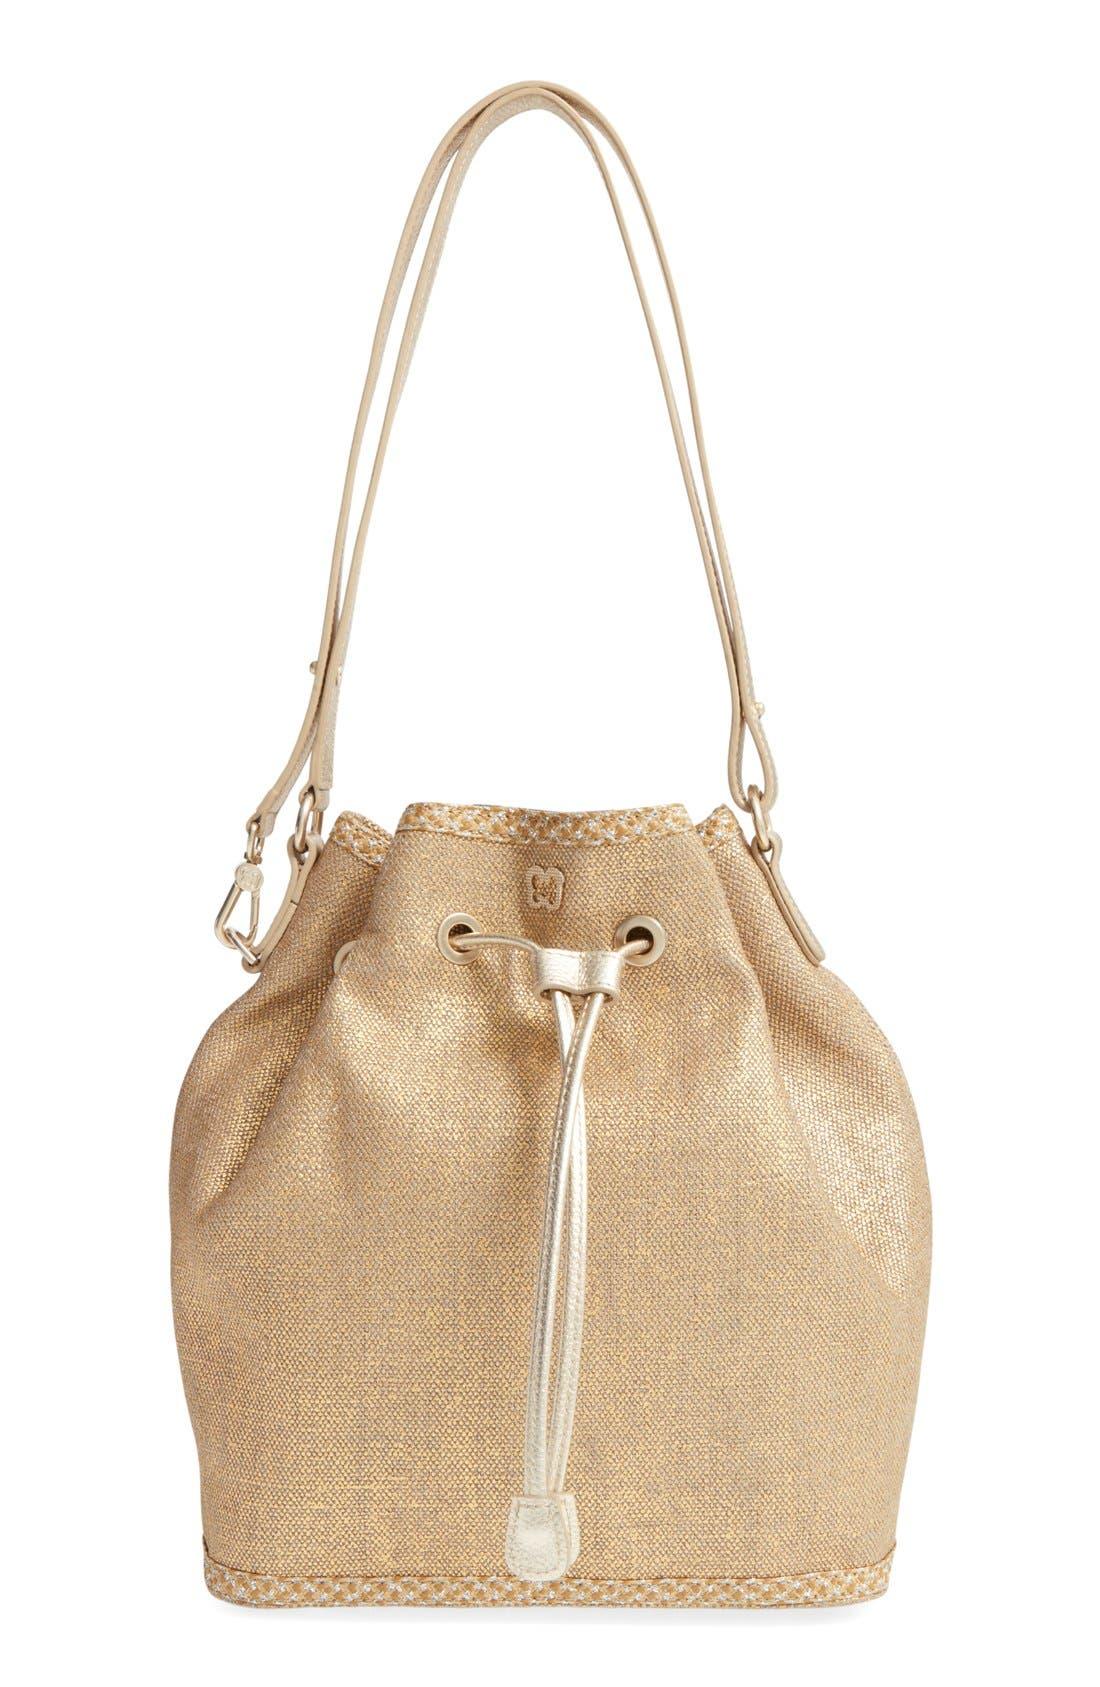 Eric Javits 'Ava' Bucket Bag